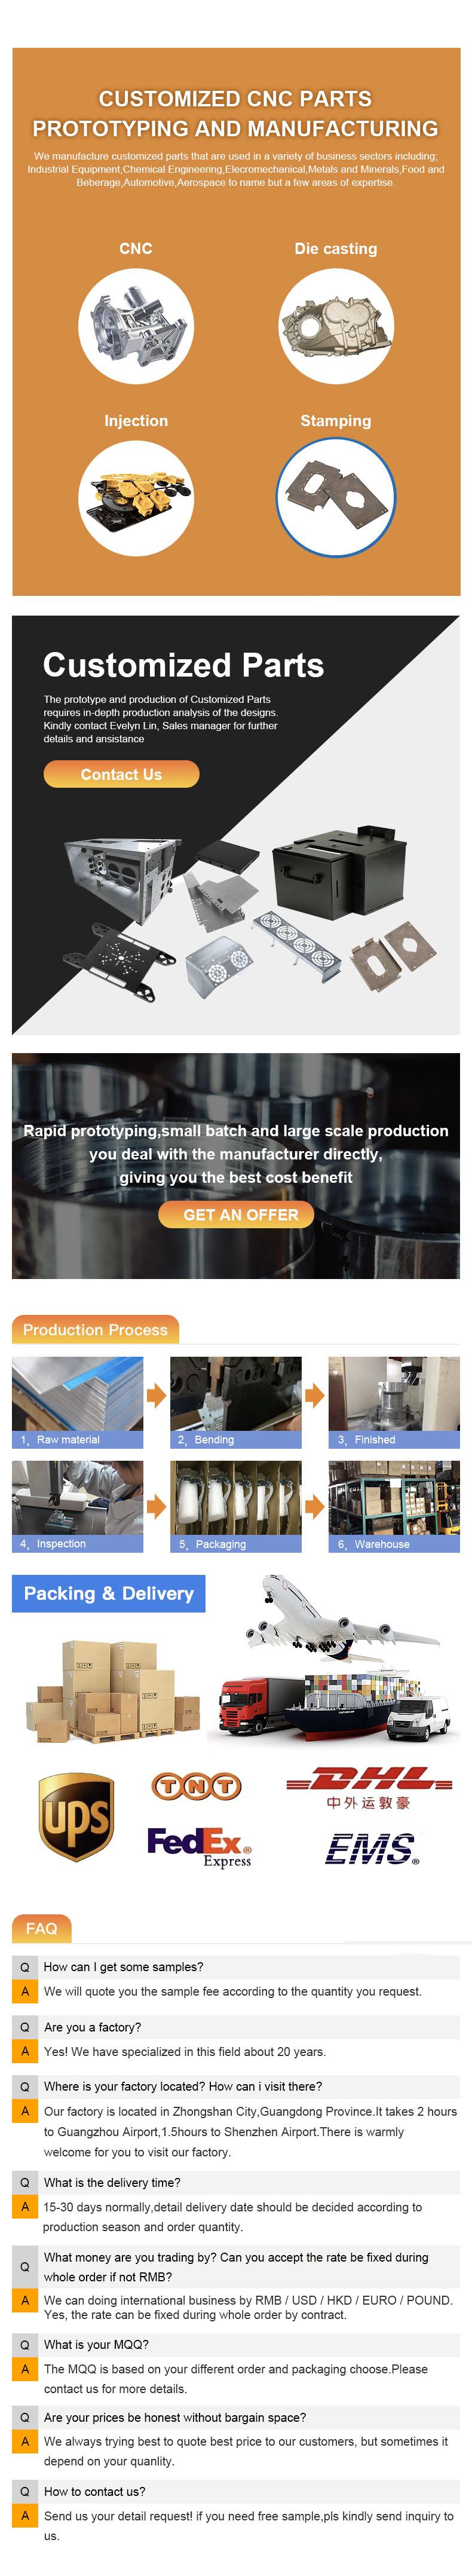 CNC MACHINING PARTS,PRECISION CNC MACHINING PARTS,CNC ALUMINUM PARTS,Machined Products,CNC Machined Products,BoYang Hardware Products,auto sheet metal stamping parts